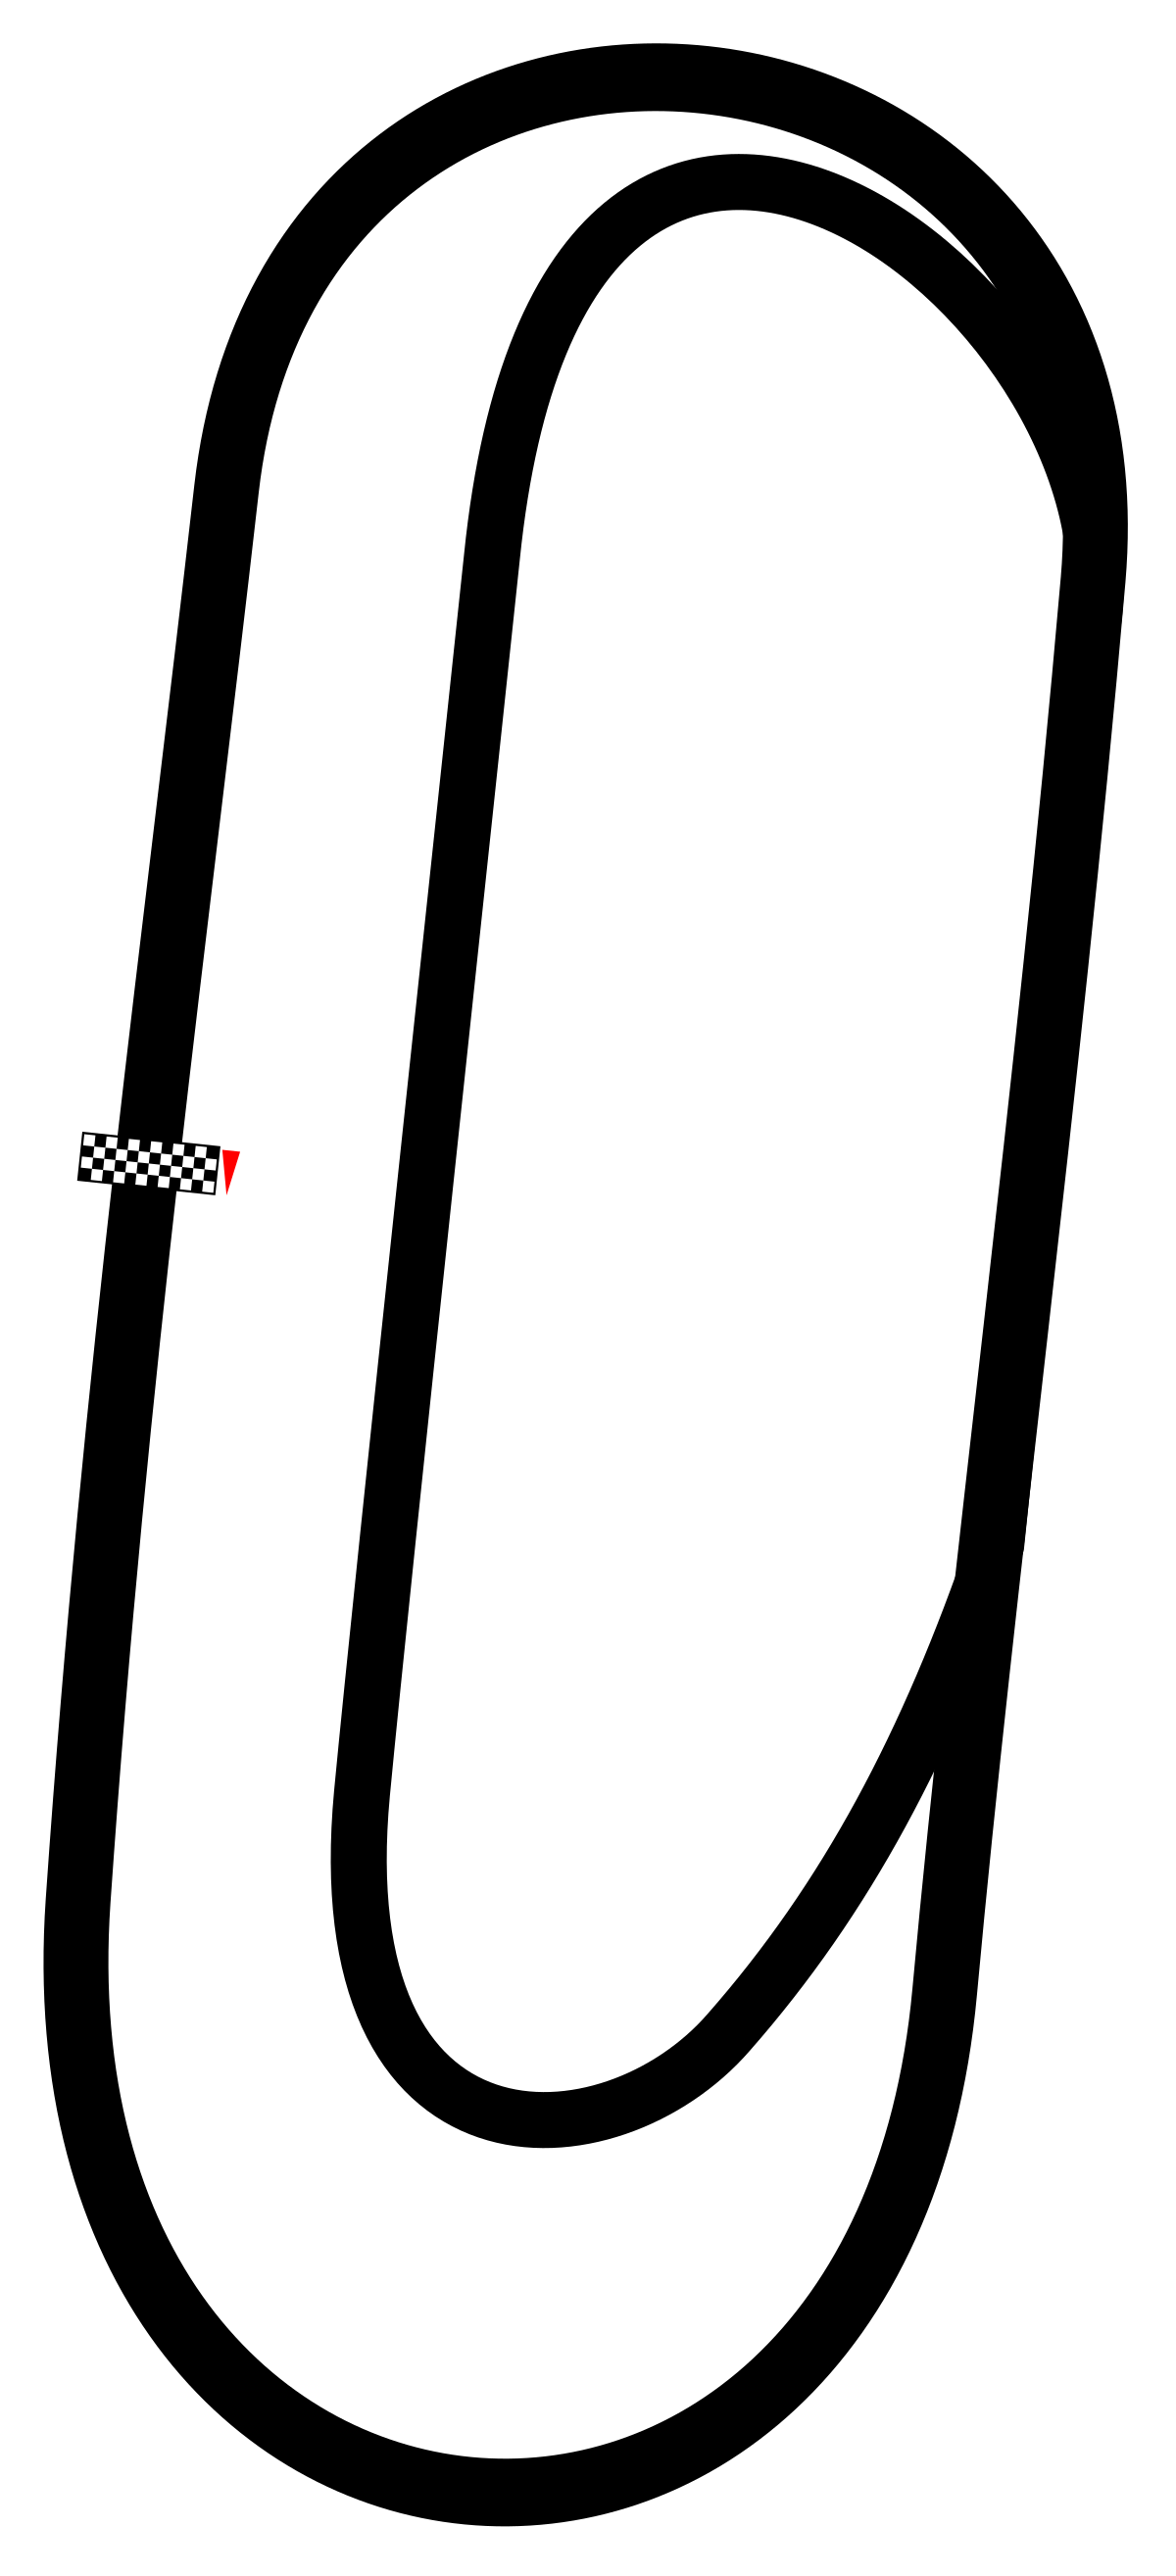 Nascar clipart grandstands. Thompson speedway motorsports park